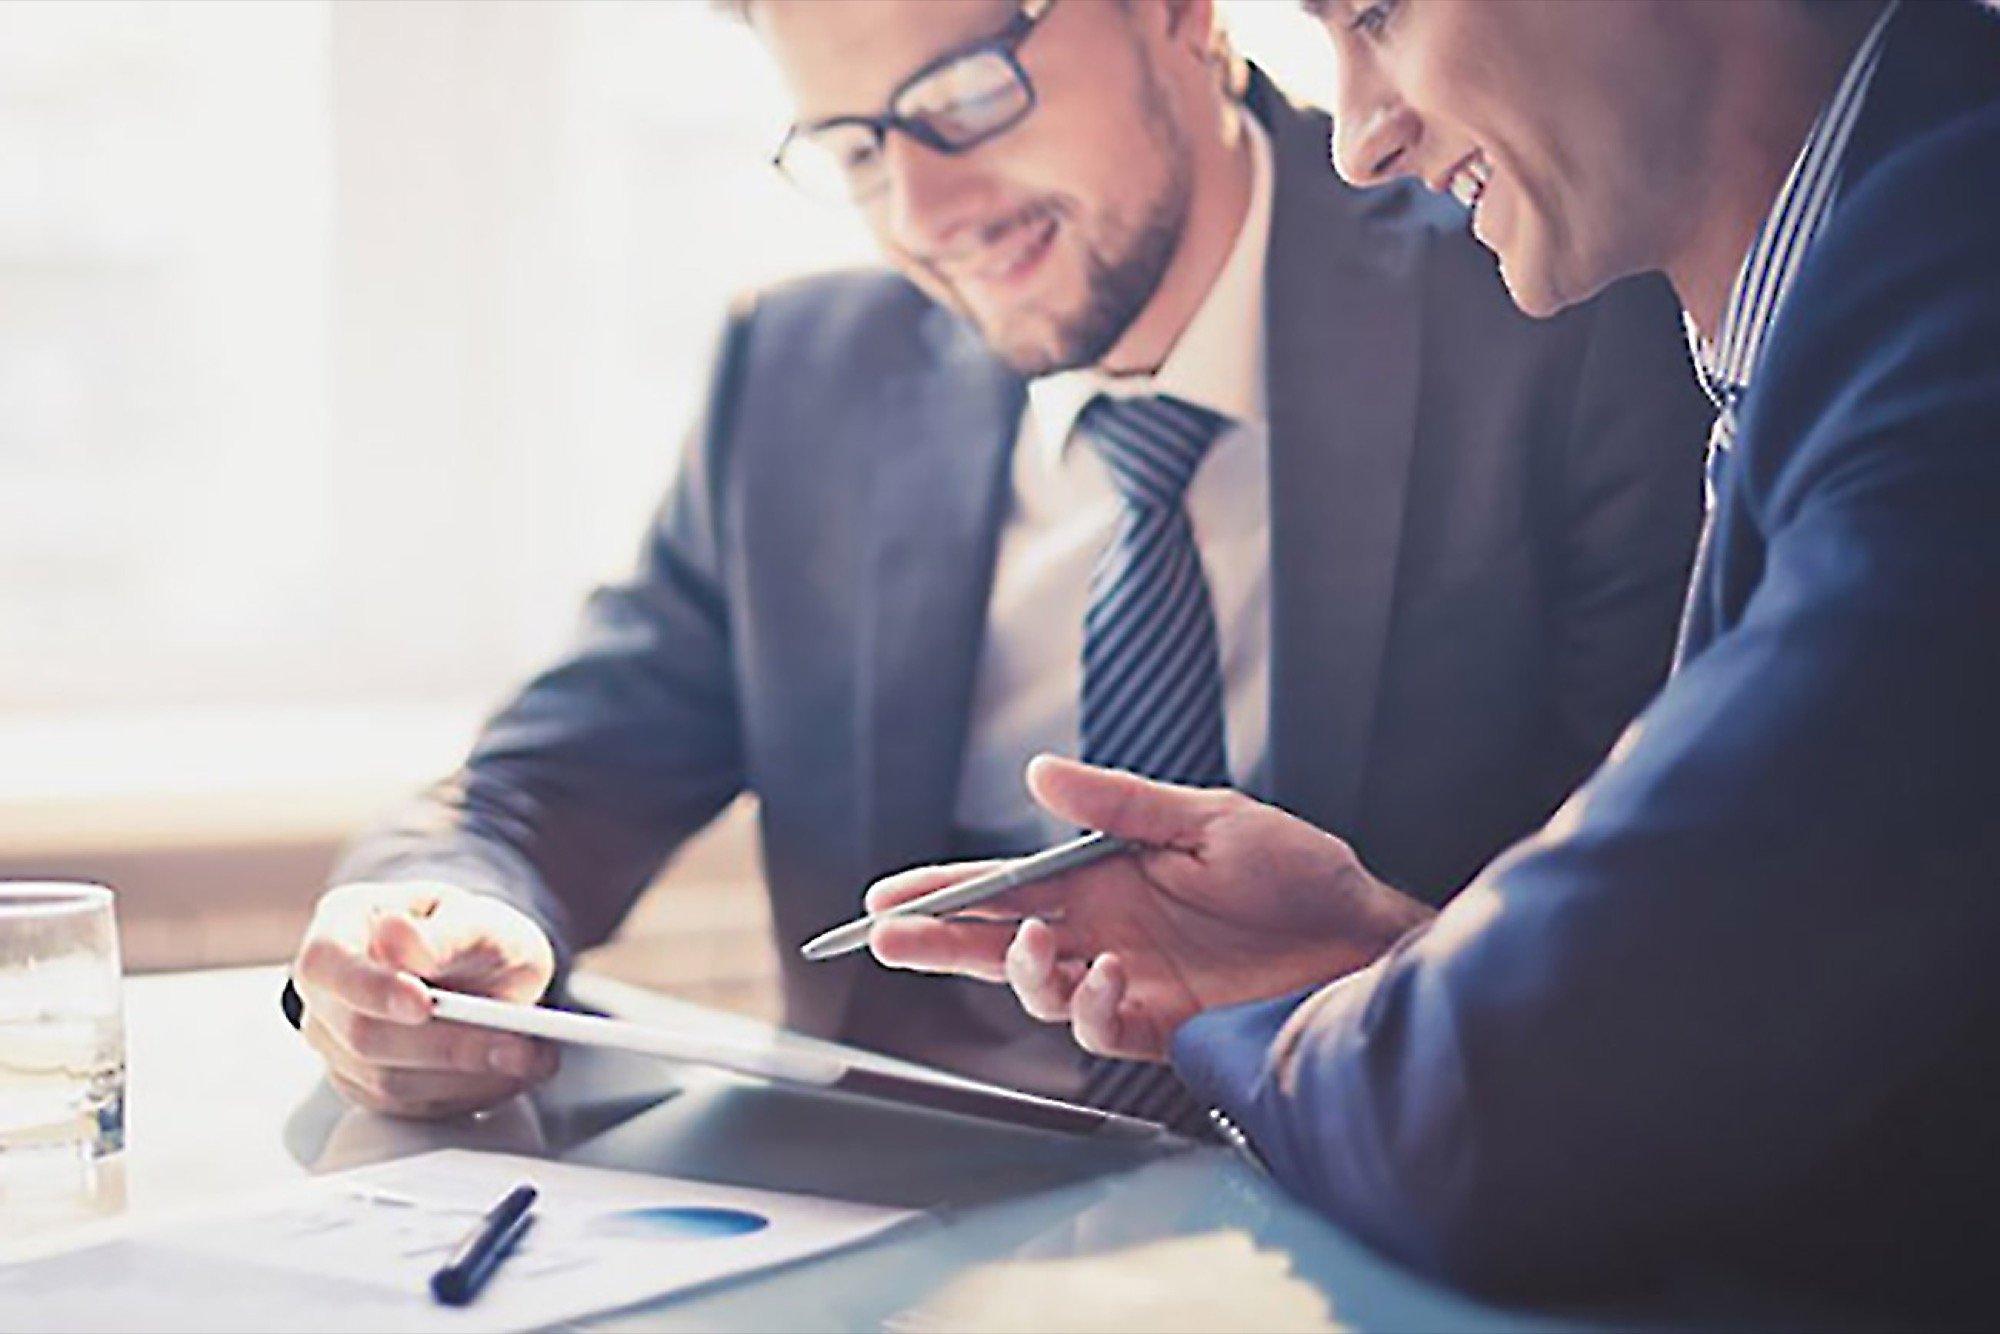 Checklist for Technical Hire Vetting